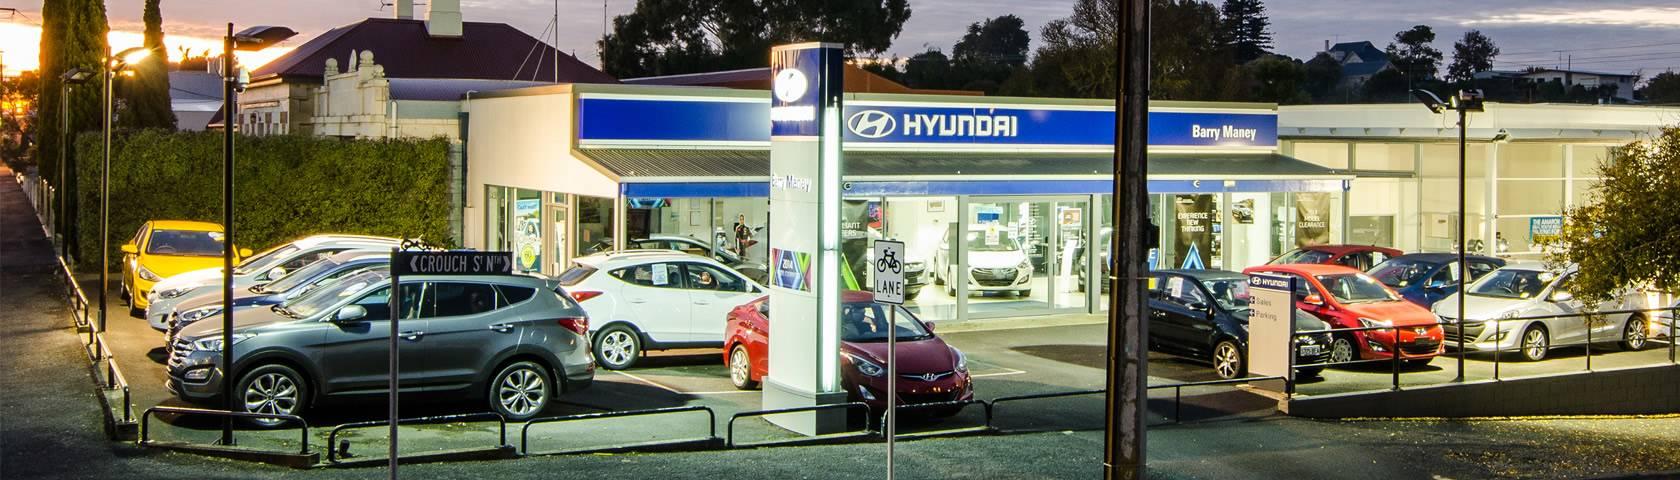 Barry Maney Hyundai